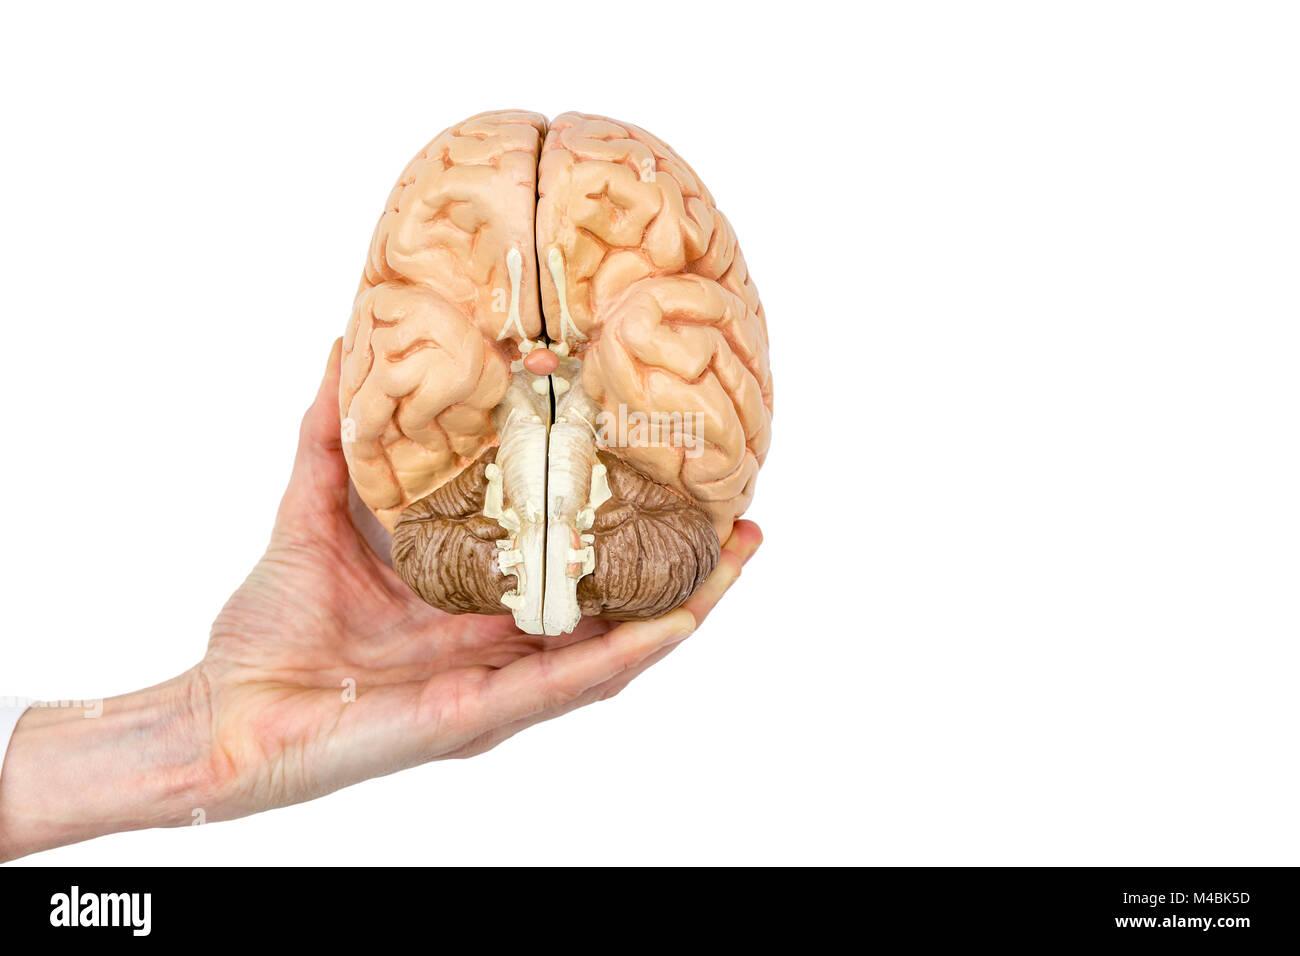 Human Psyche Stockfotos & Human Psyche Bilder - Alamy